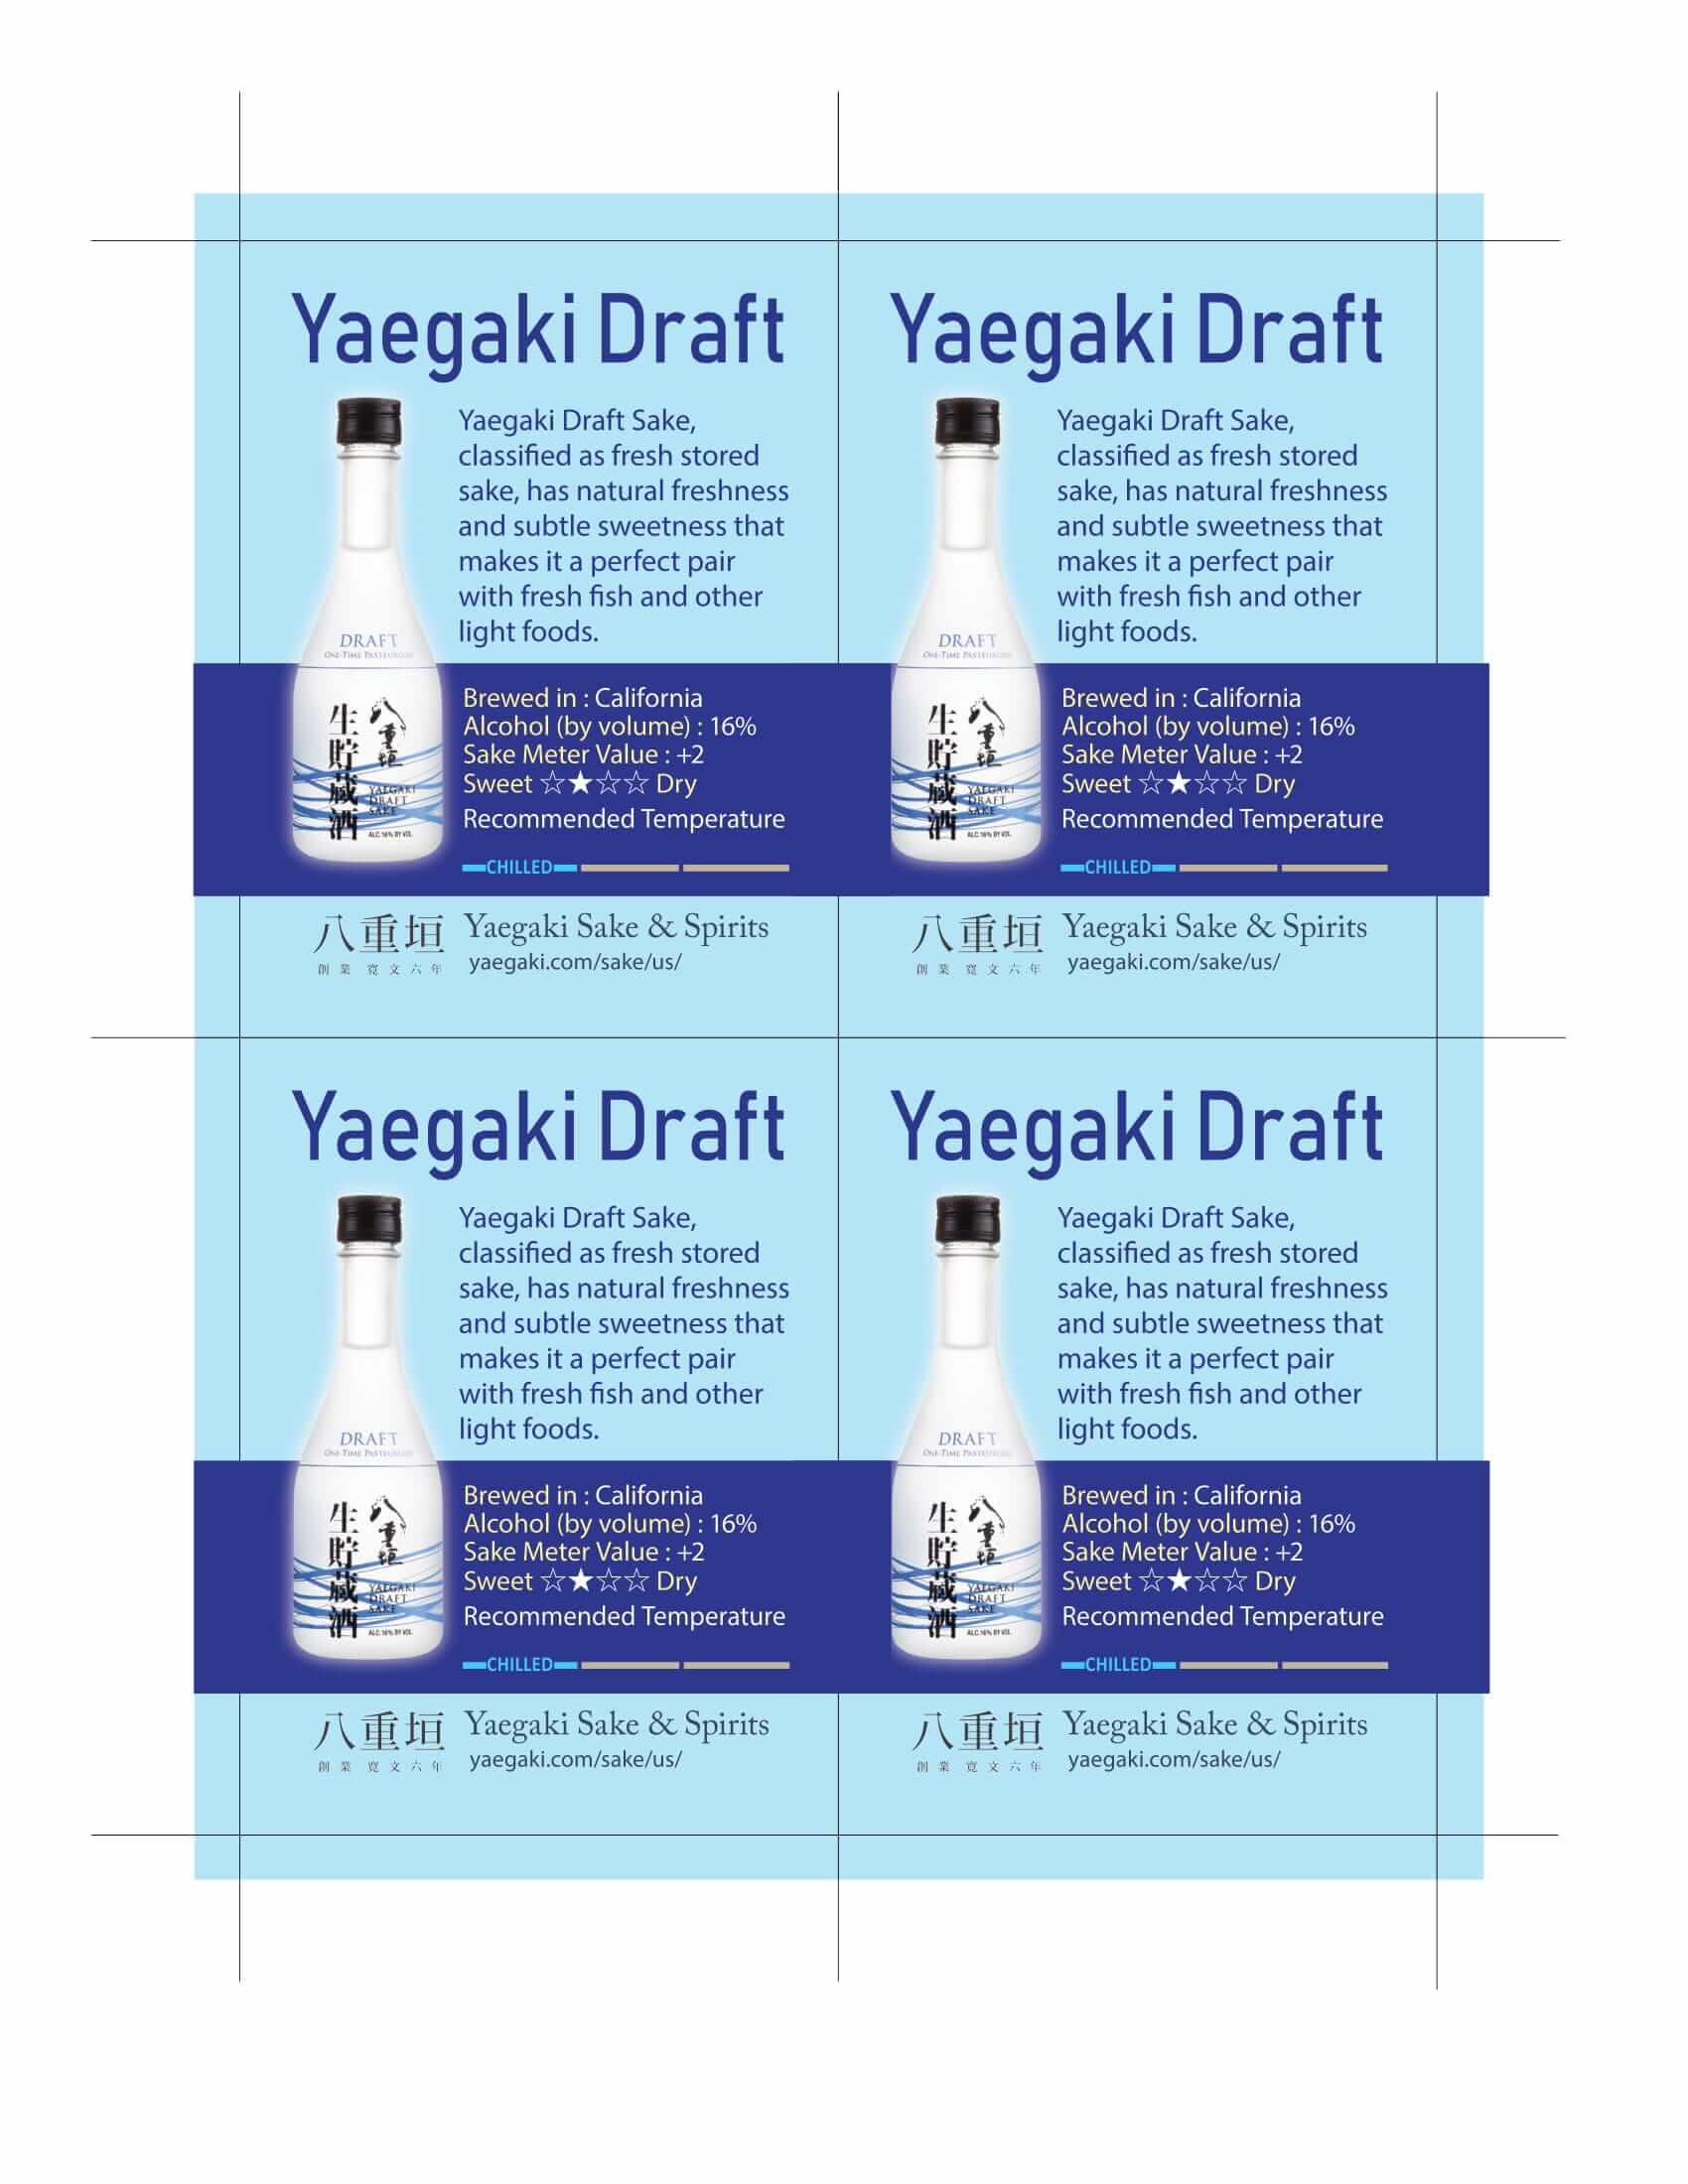 Yaegaki Draft Shelf Talker